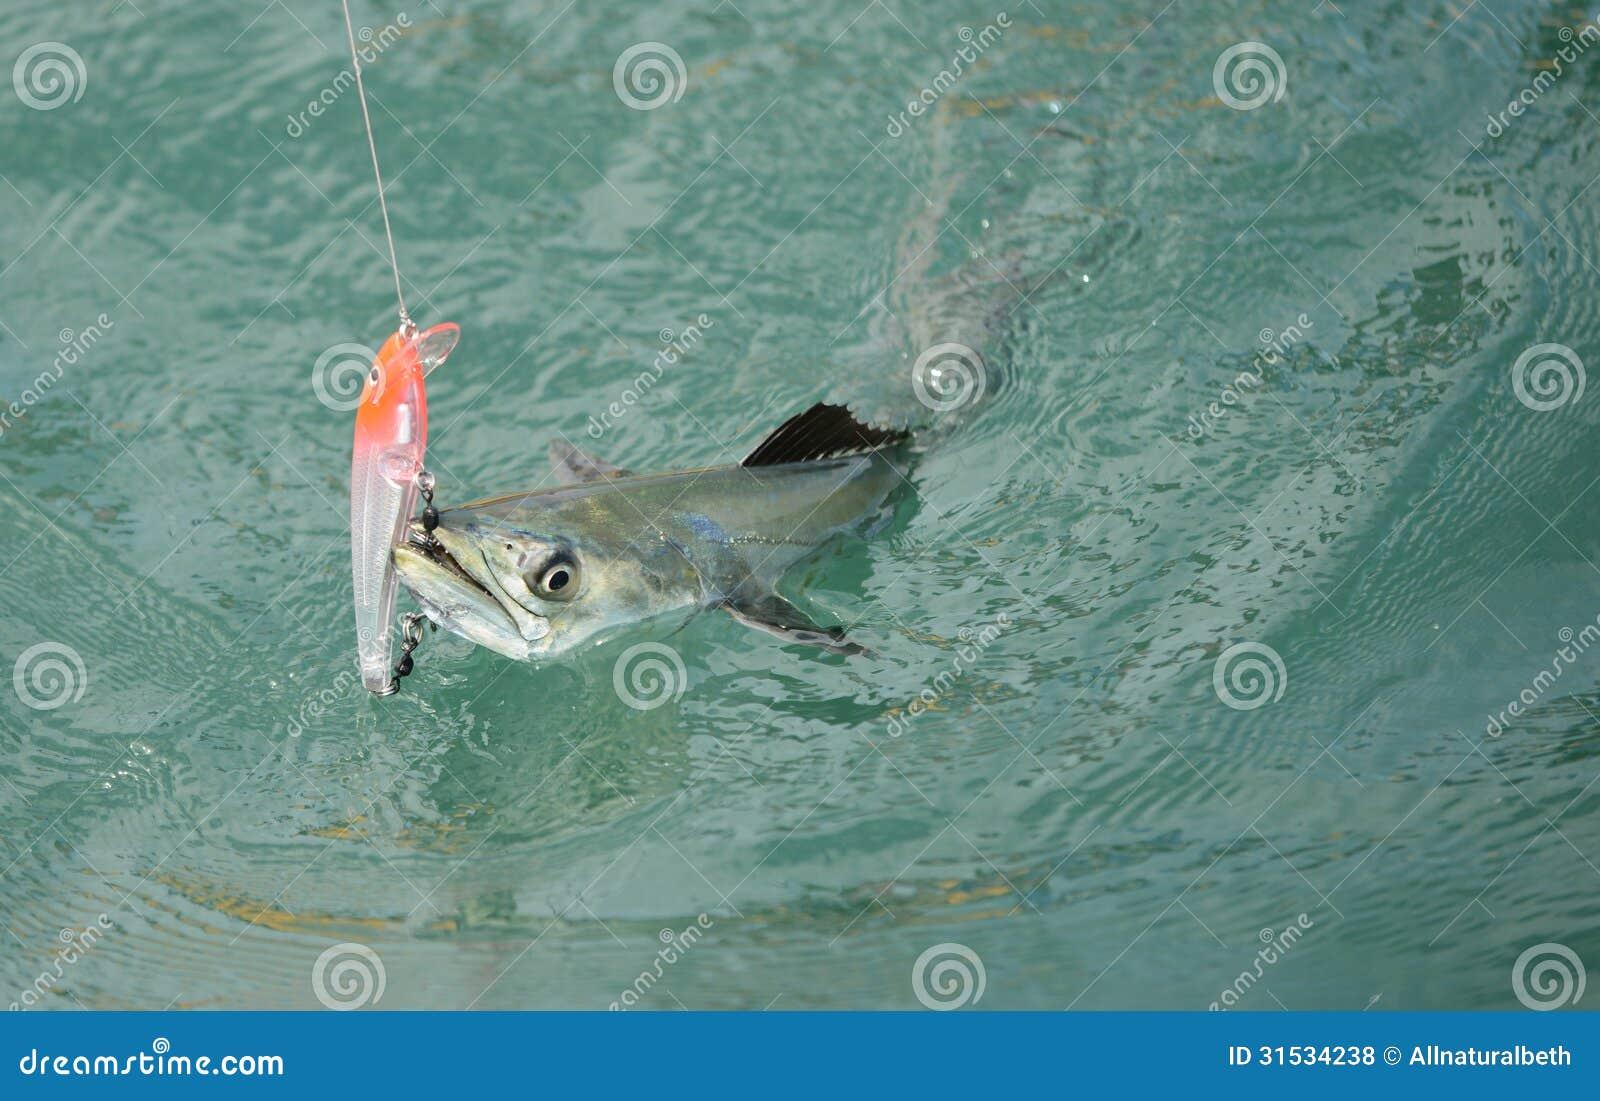 Spanish mackerel fish caught on hook and fishing line for Fishing rod in spanish